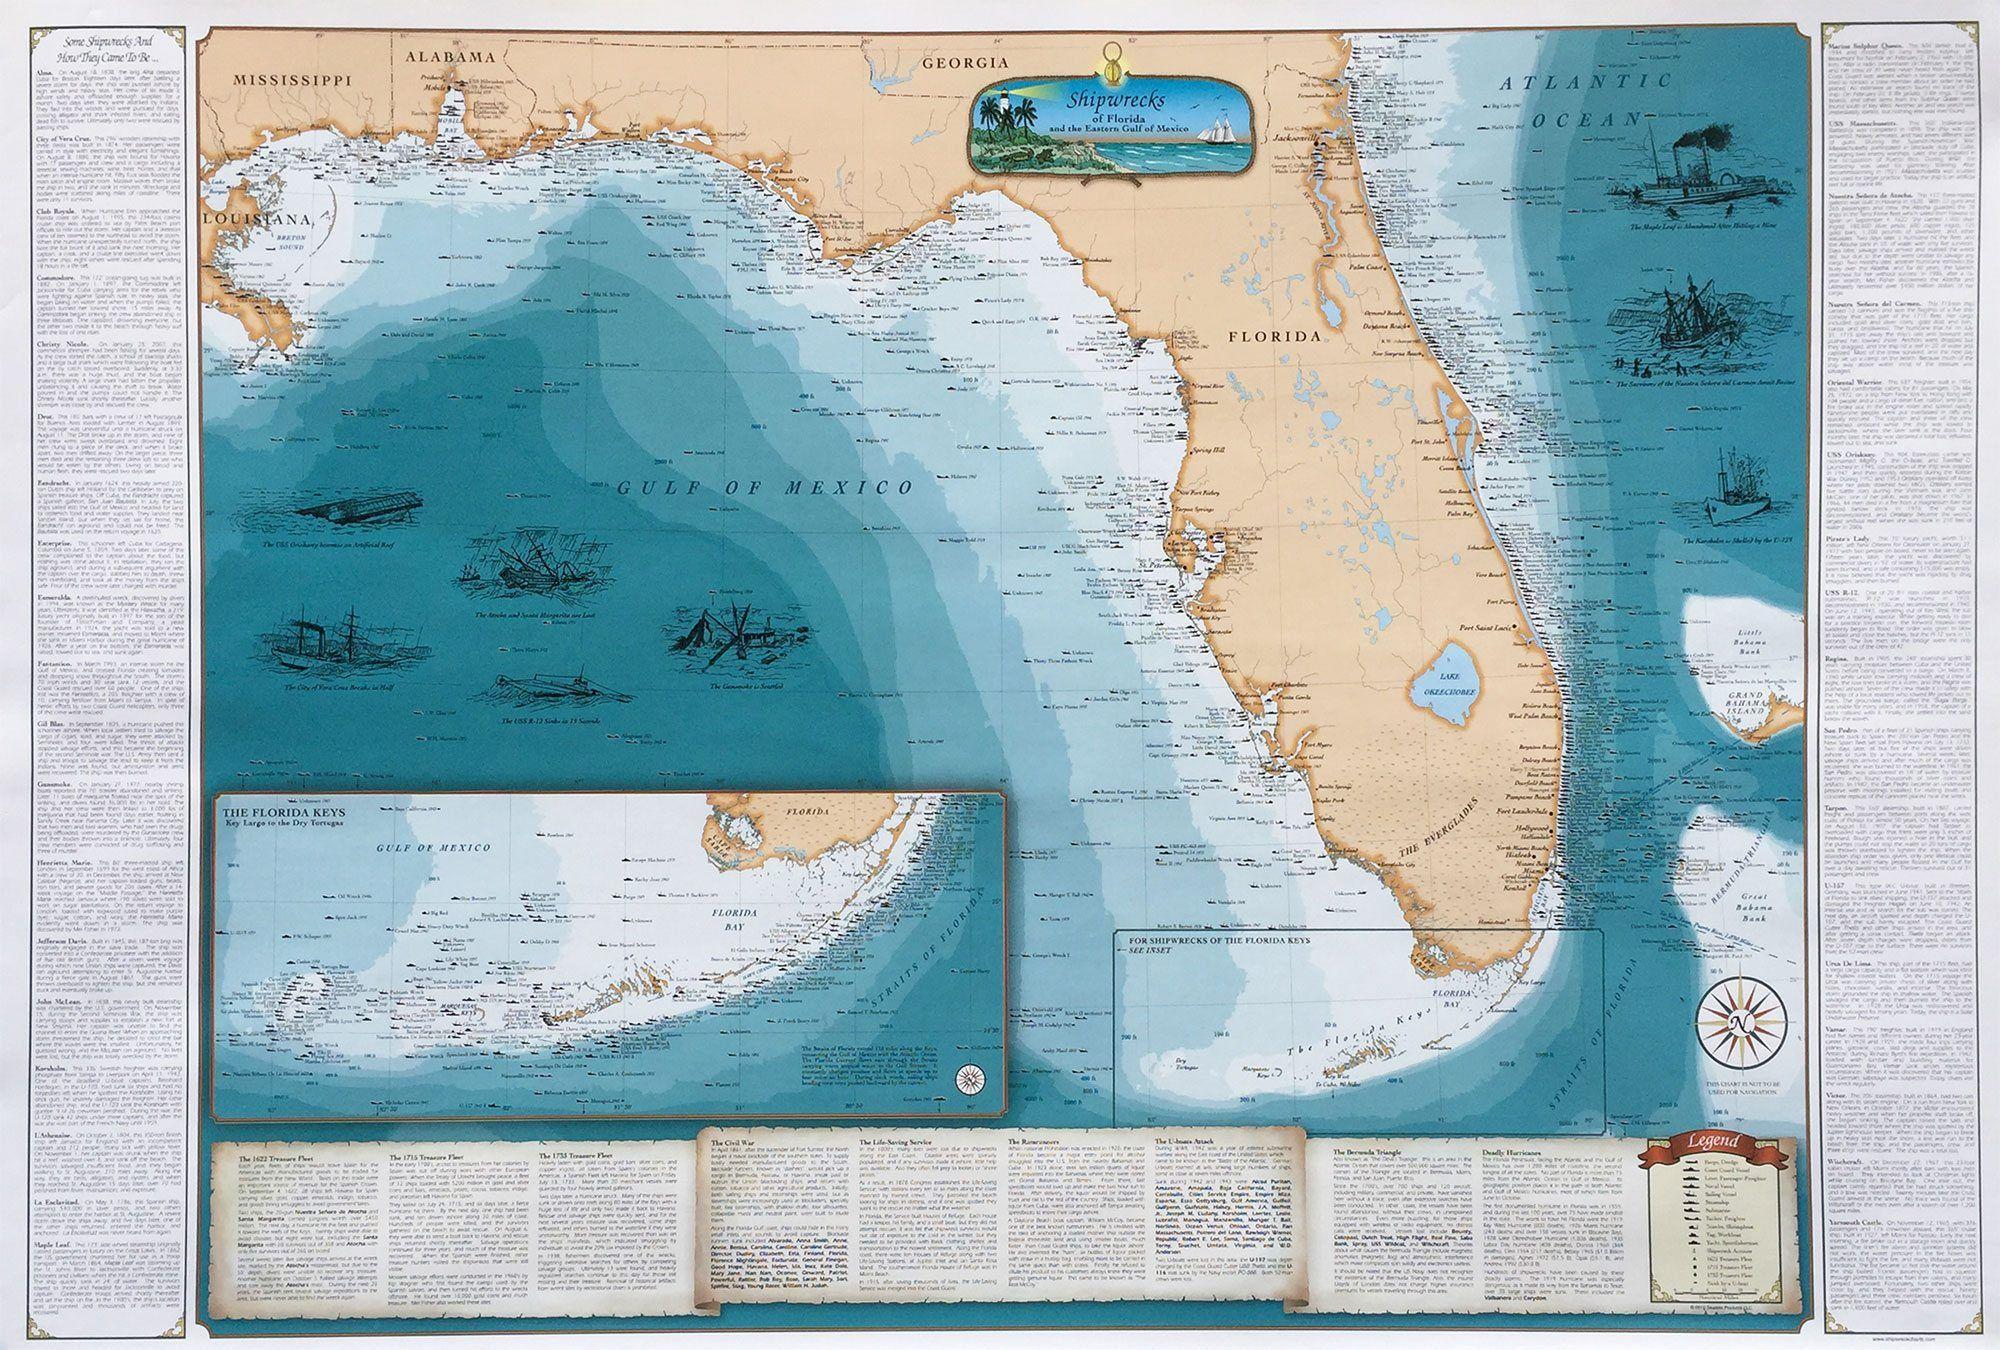 Florida Shipwrecks Map.Shipwrecks Of Florida And The Eastern Gulf Of Mexico Maps